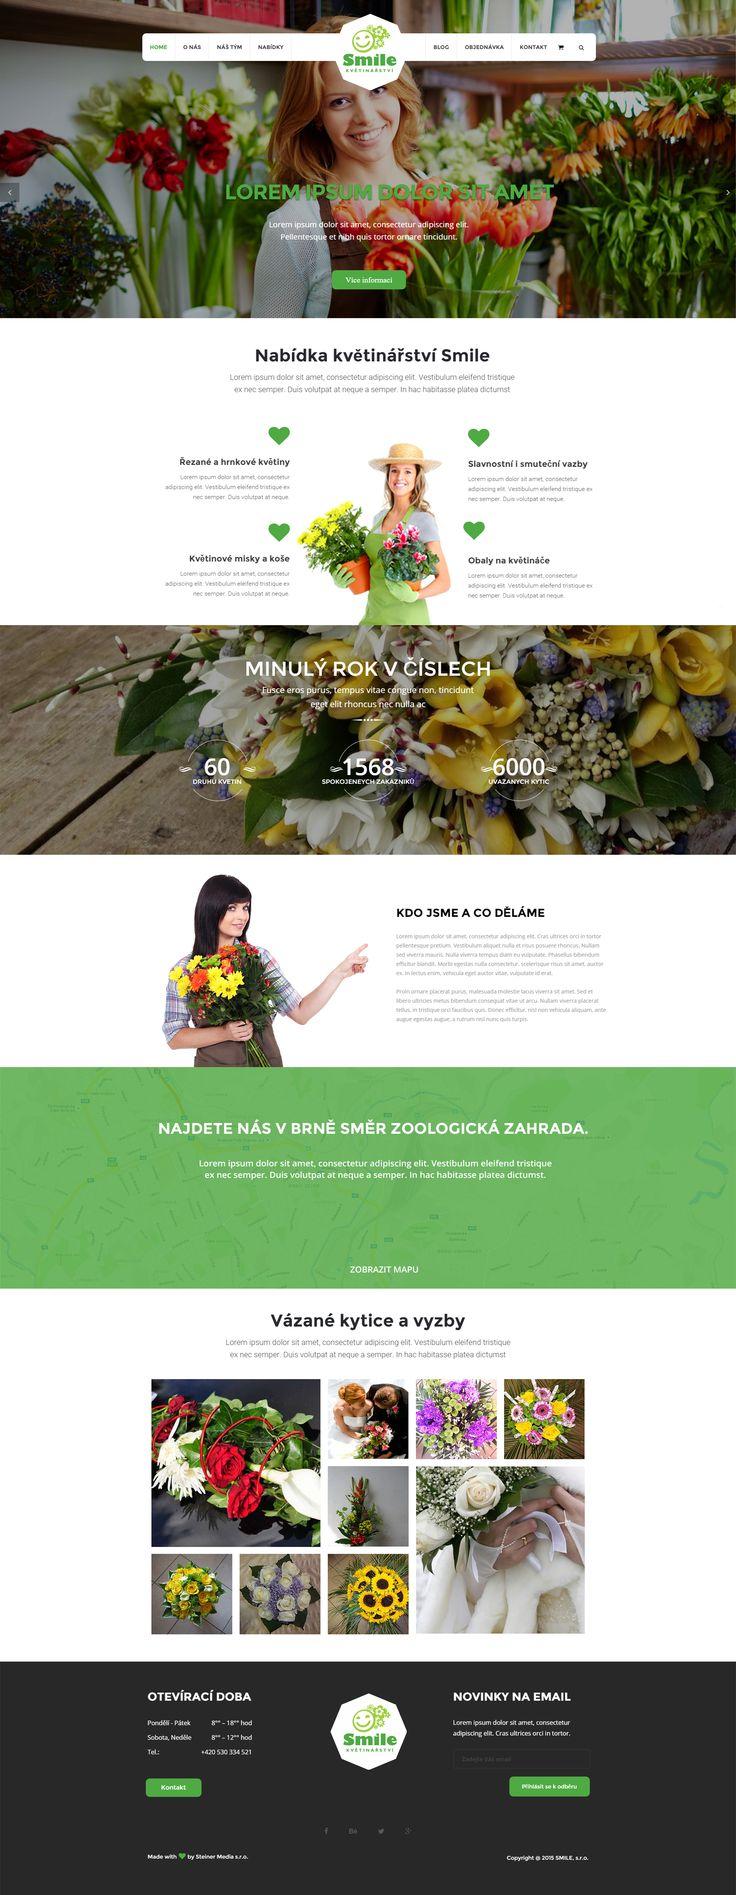 Web s prodejem květin pro majitele Smile. Made with ♥ in Brno by Steiner Media